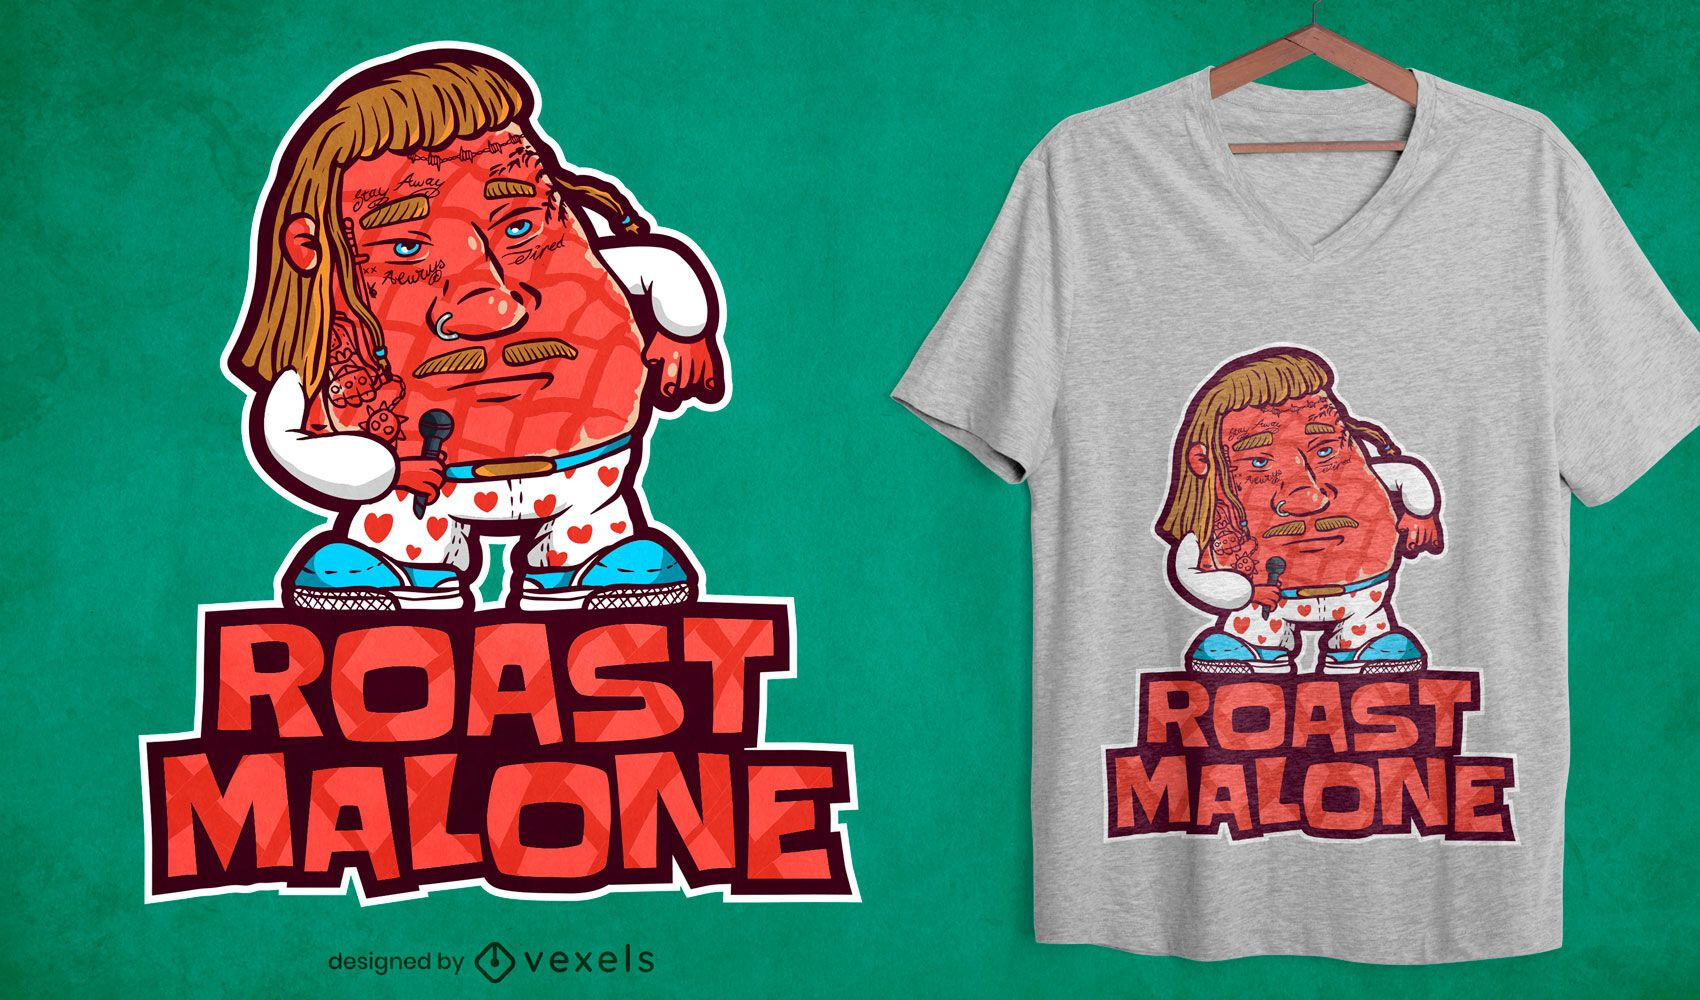 Roast malone t-shirt design